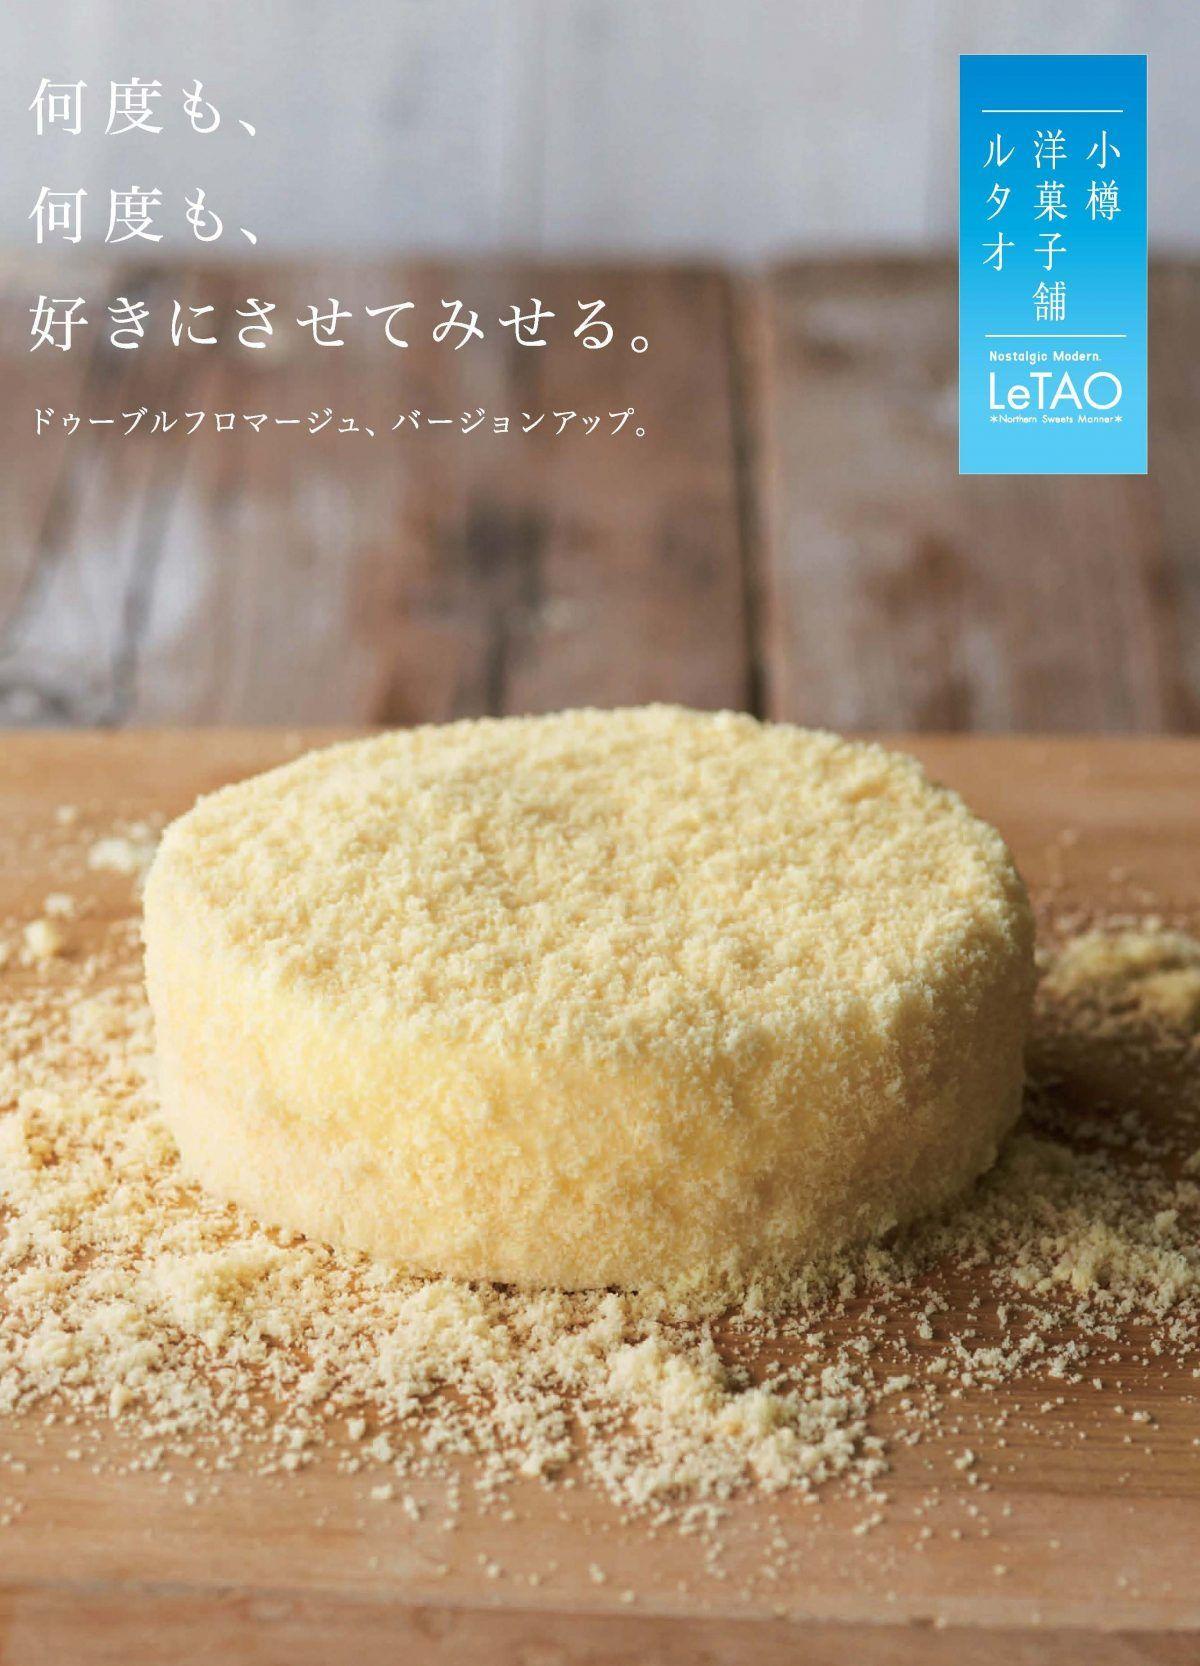 LeTAO Singapore Japan's No.1 Cheesecake in 2020 Food